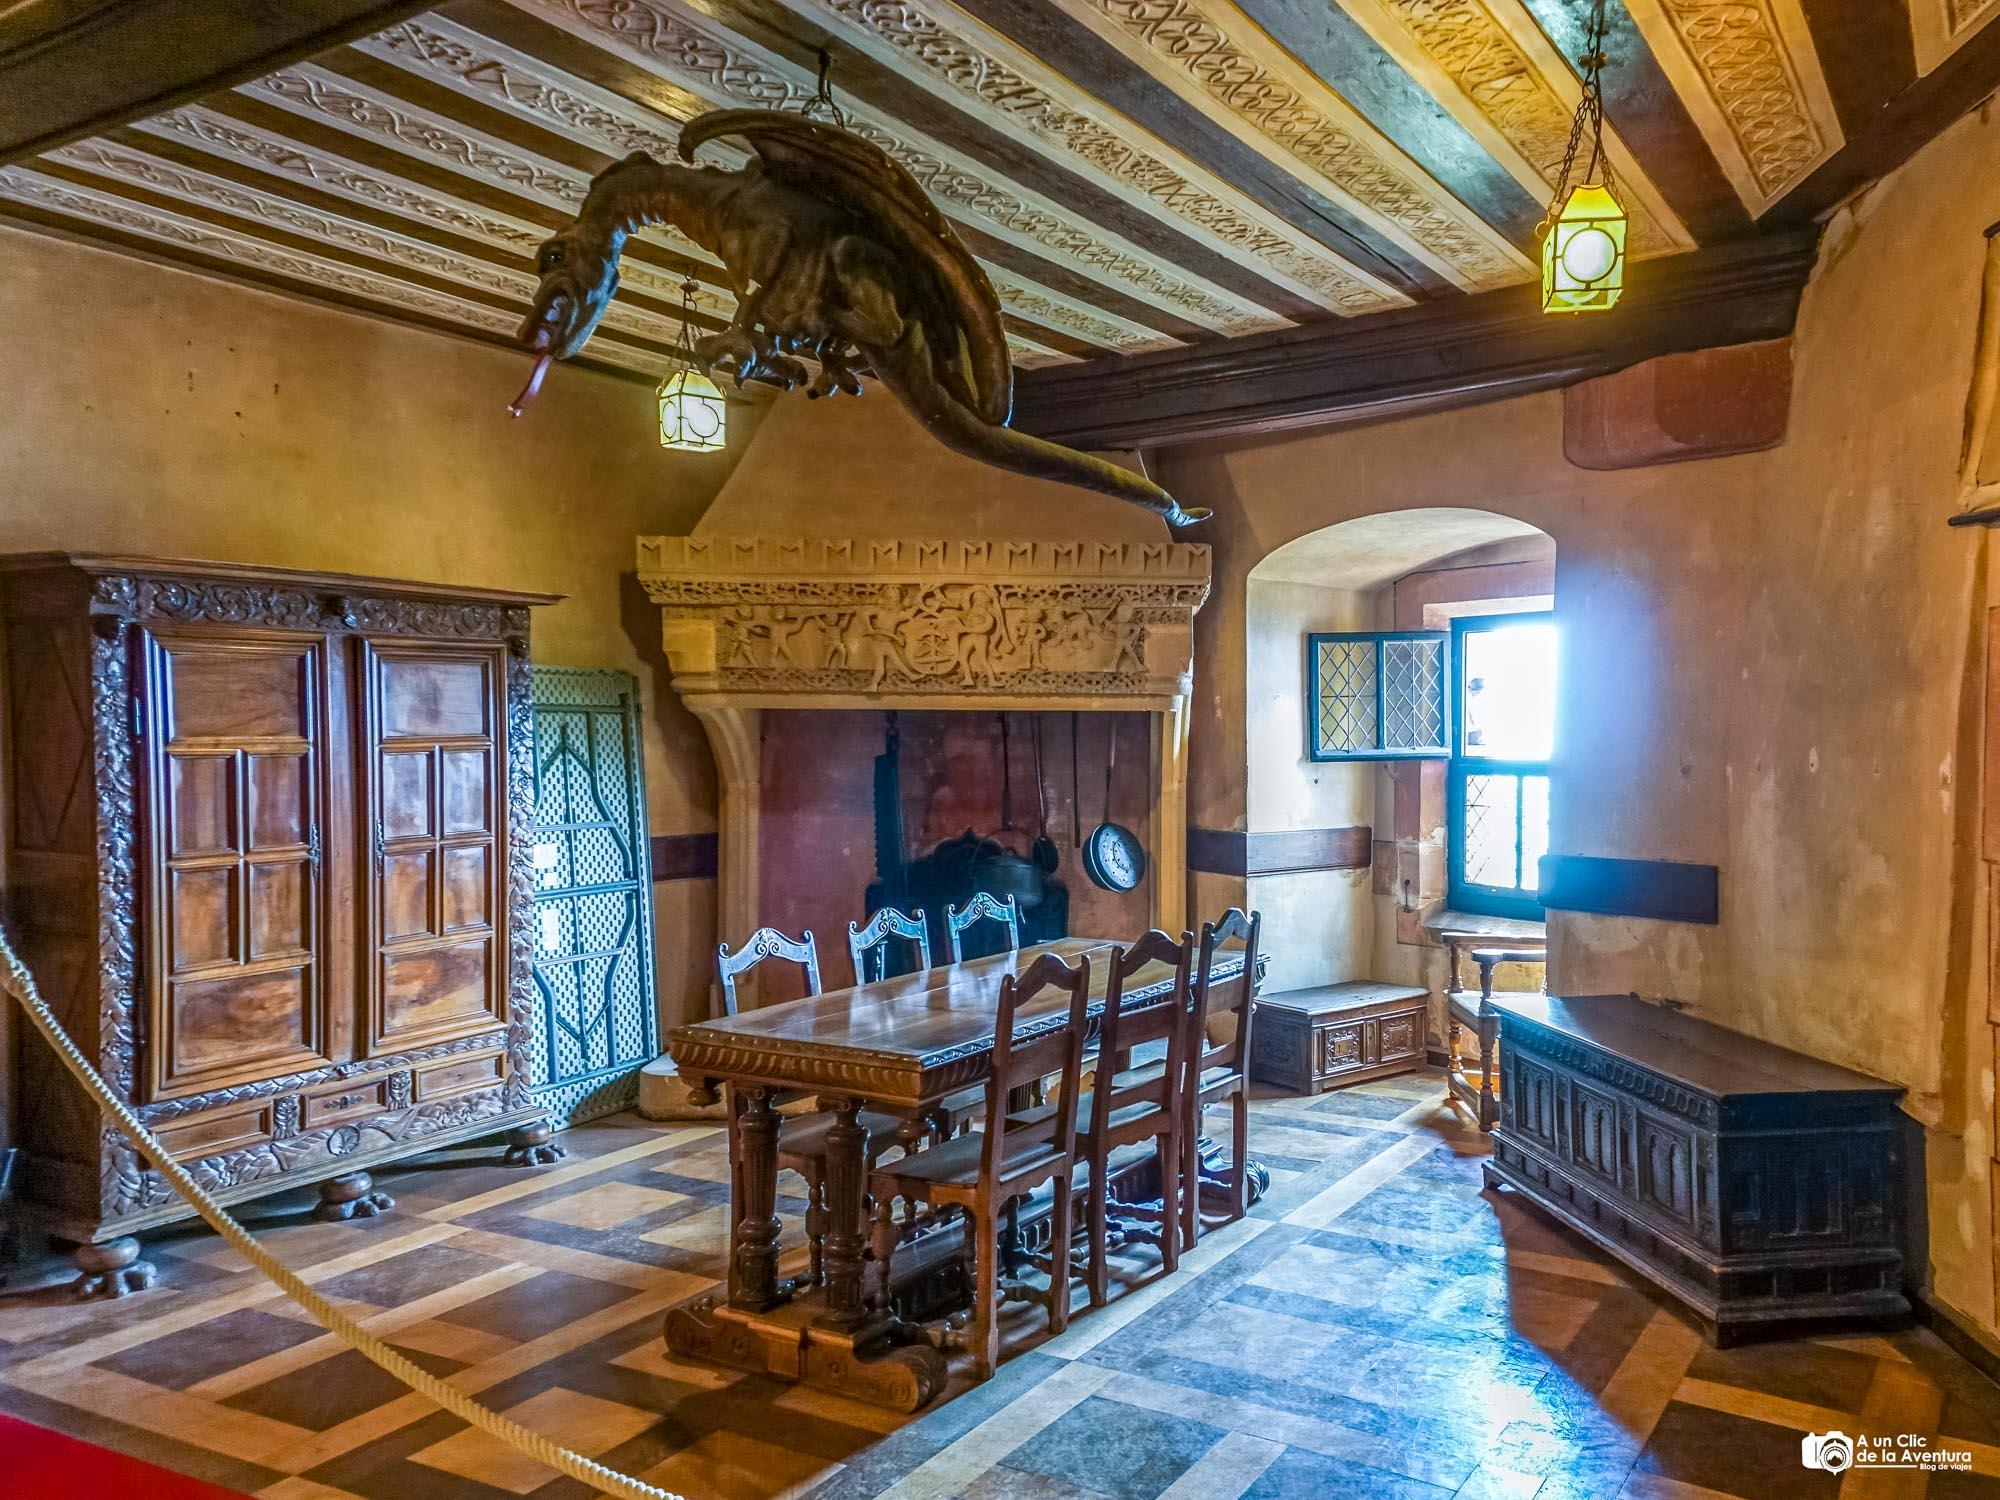 Sala de Lorena del Castillo de Haut-Koenigsbourg